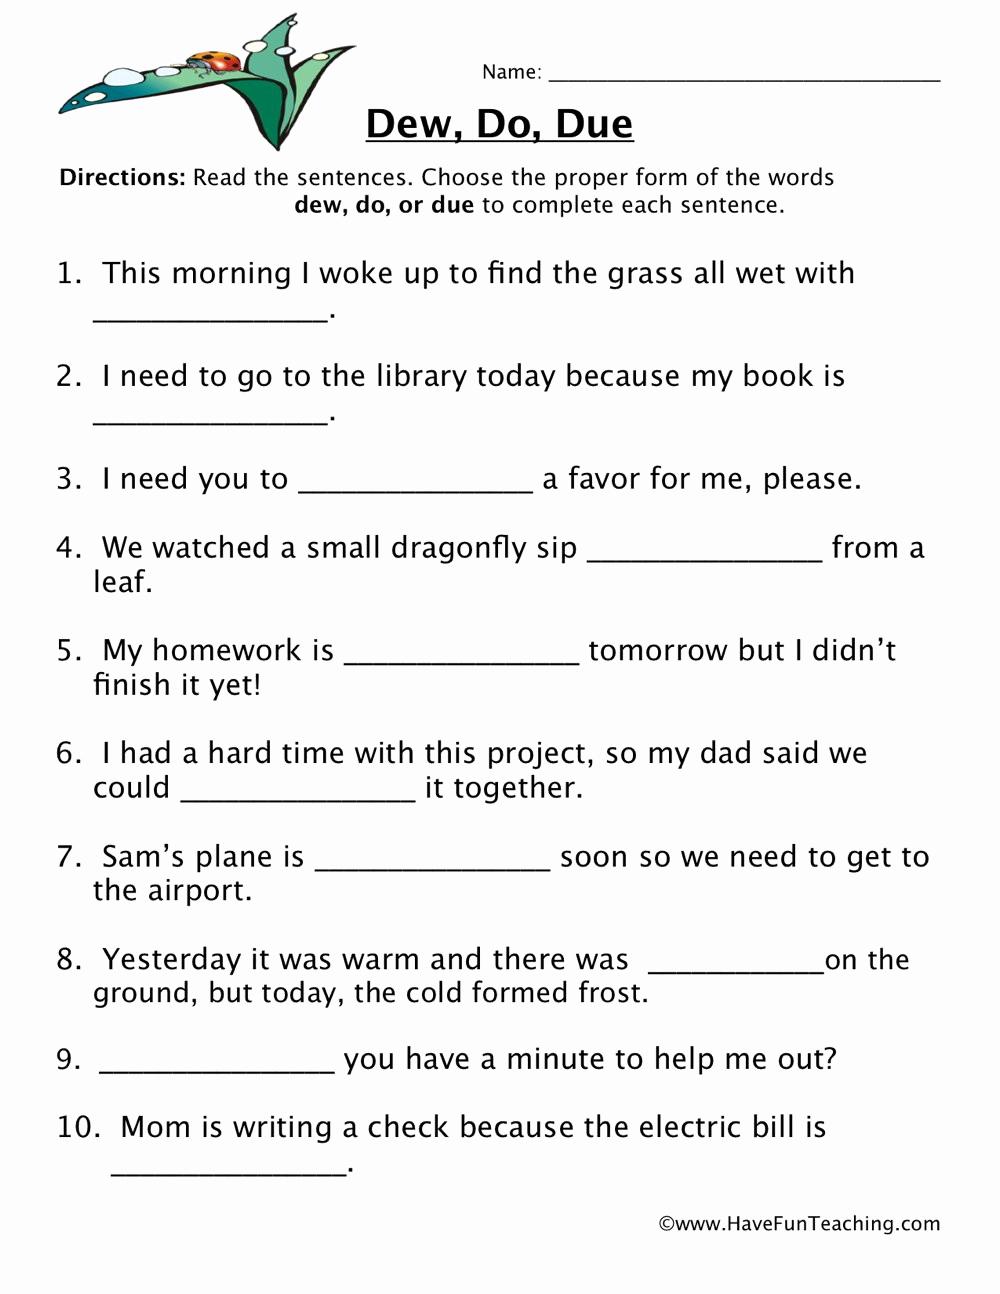 Homonyms Worksheets 5th Grade Lovely Homophones Worksheet 5th Grade